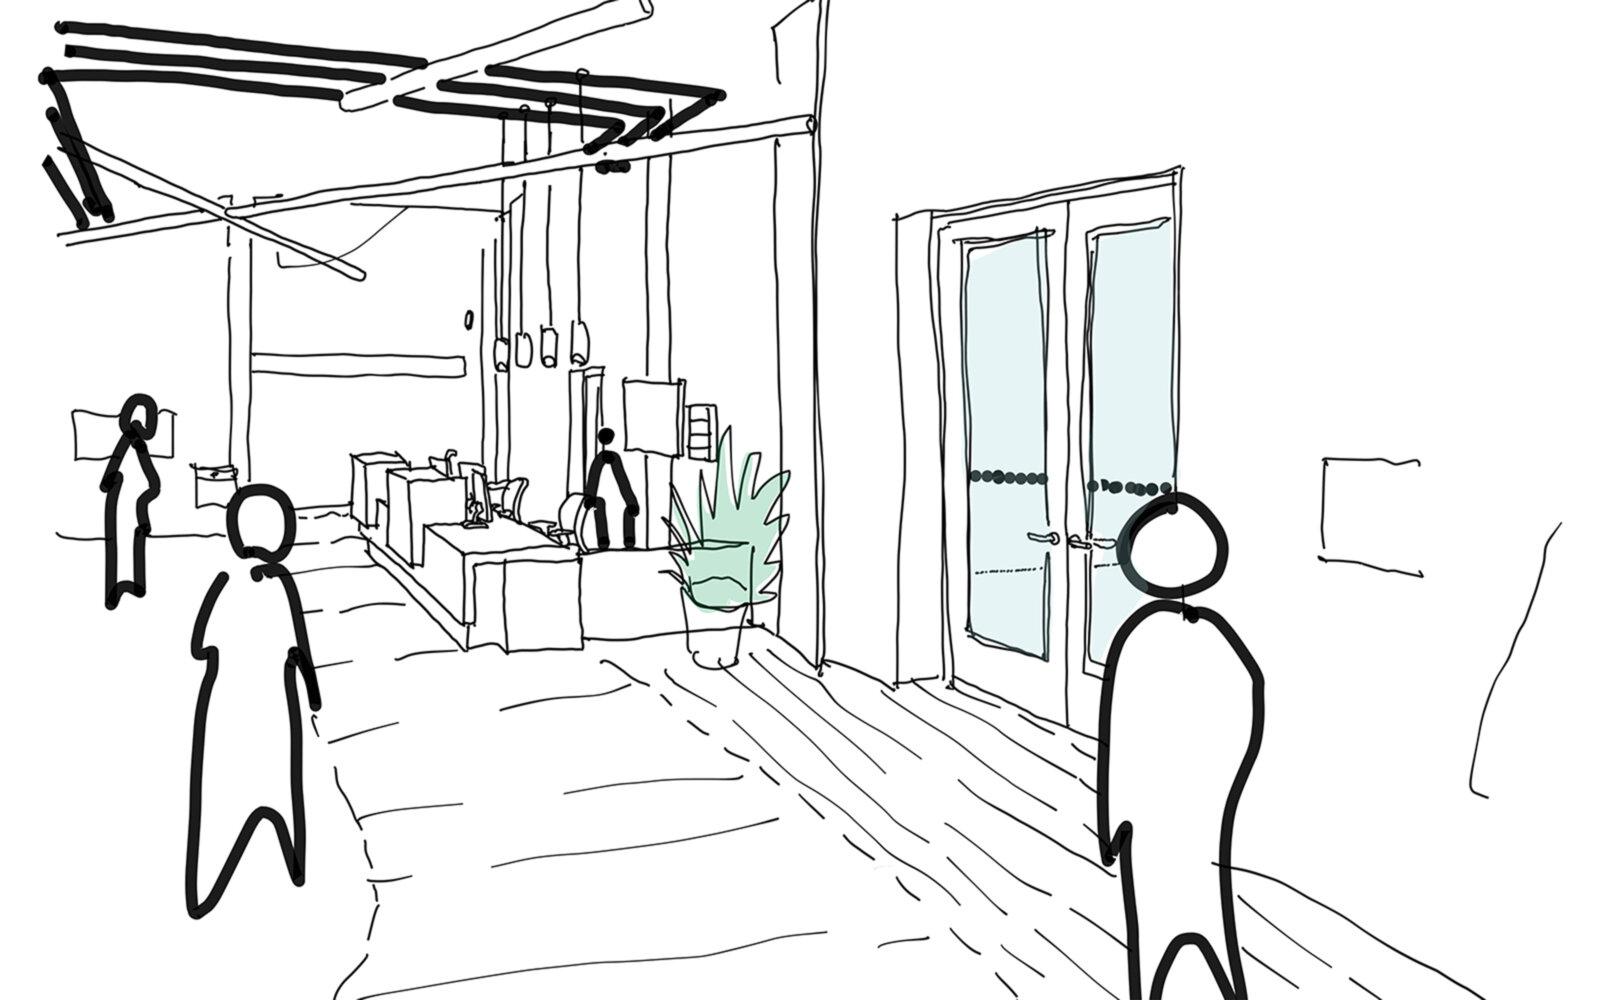 The Forum interior sketch